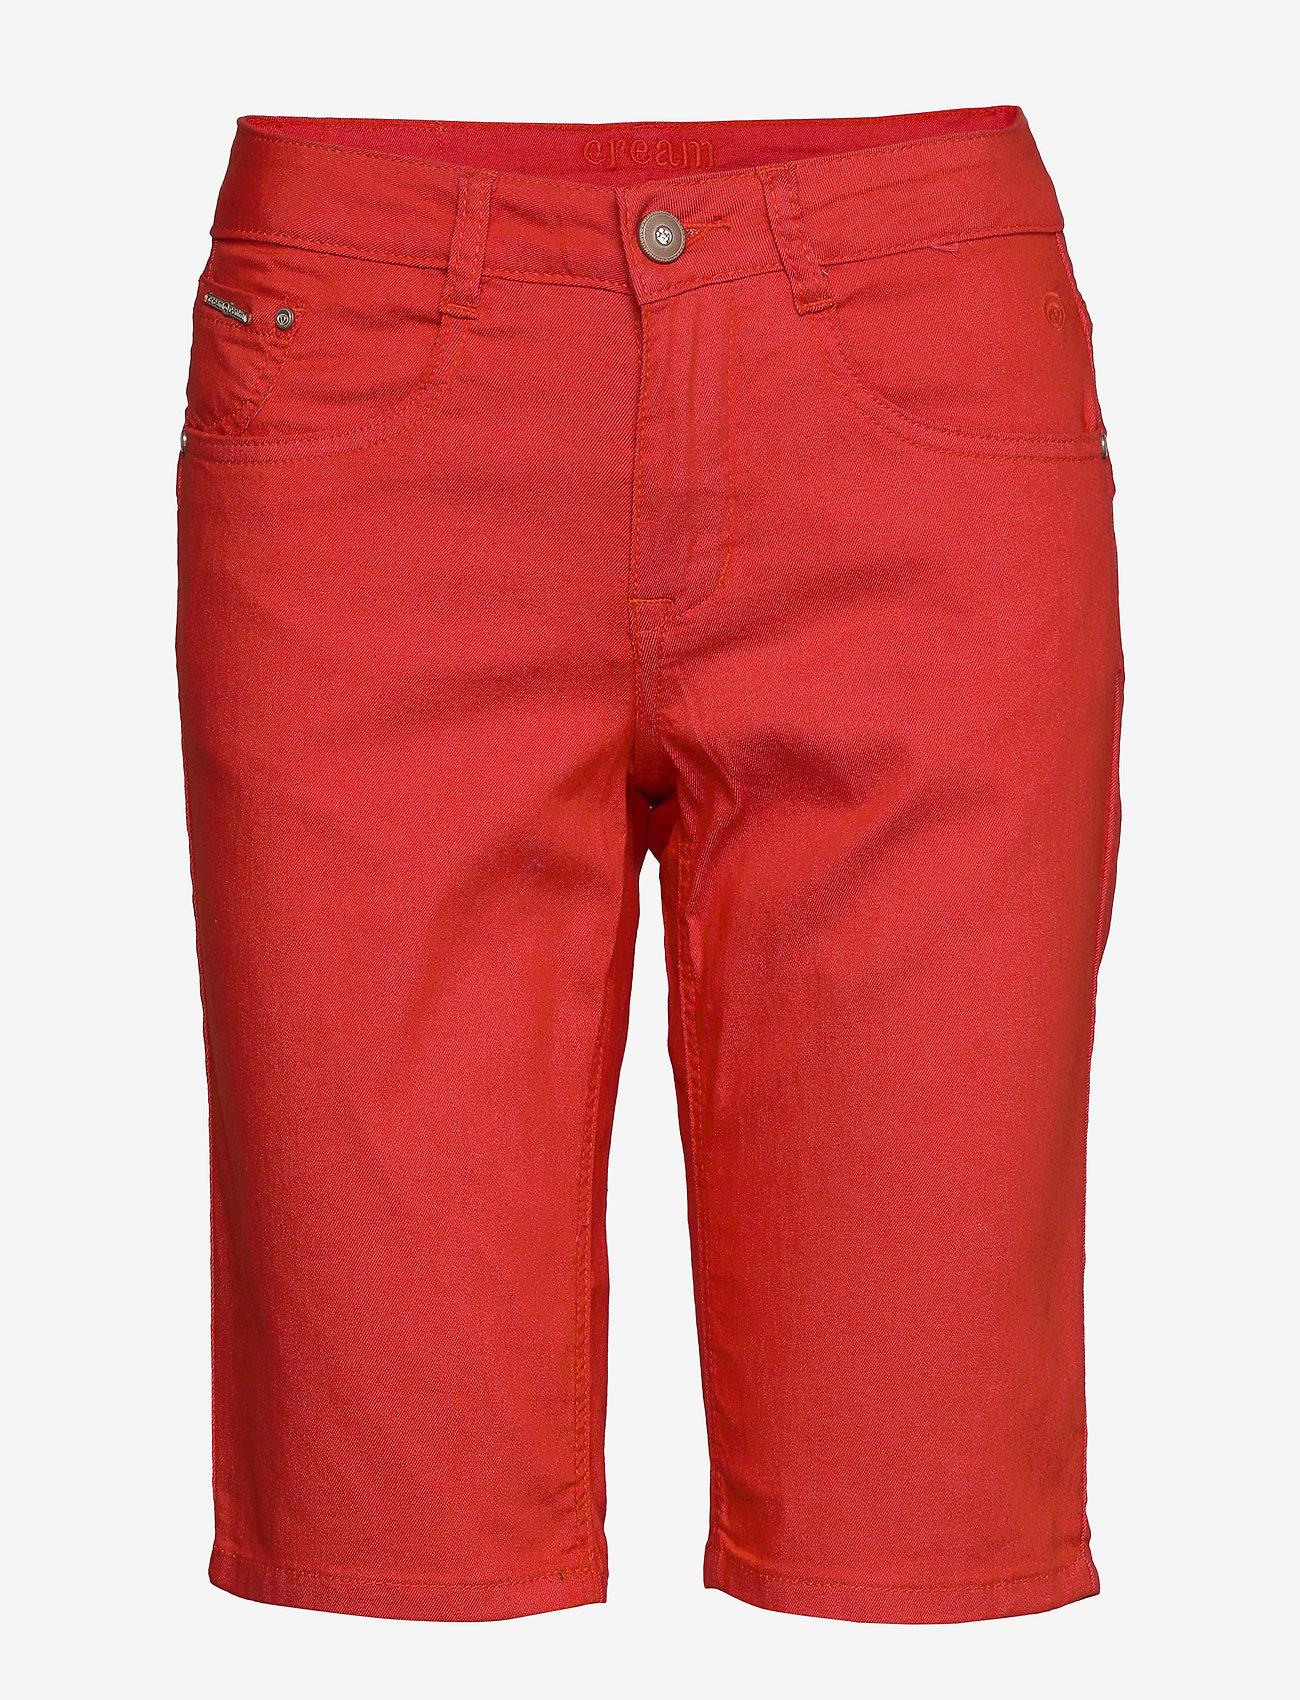 Cream - VavaCR Shorts - Coco Fit - bermuda-shortsit - aurora red - 0